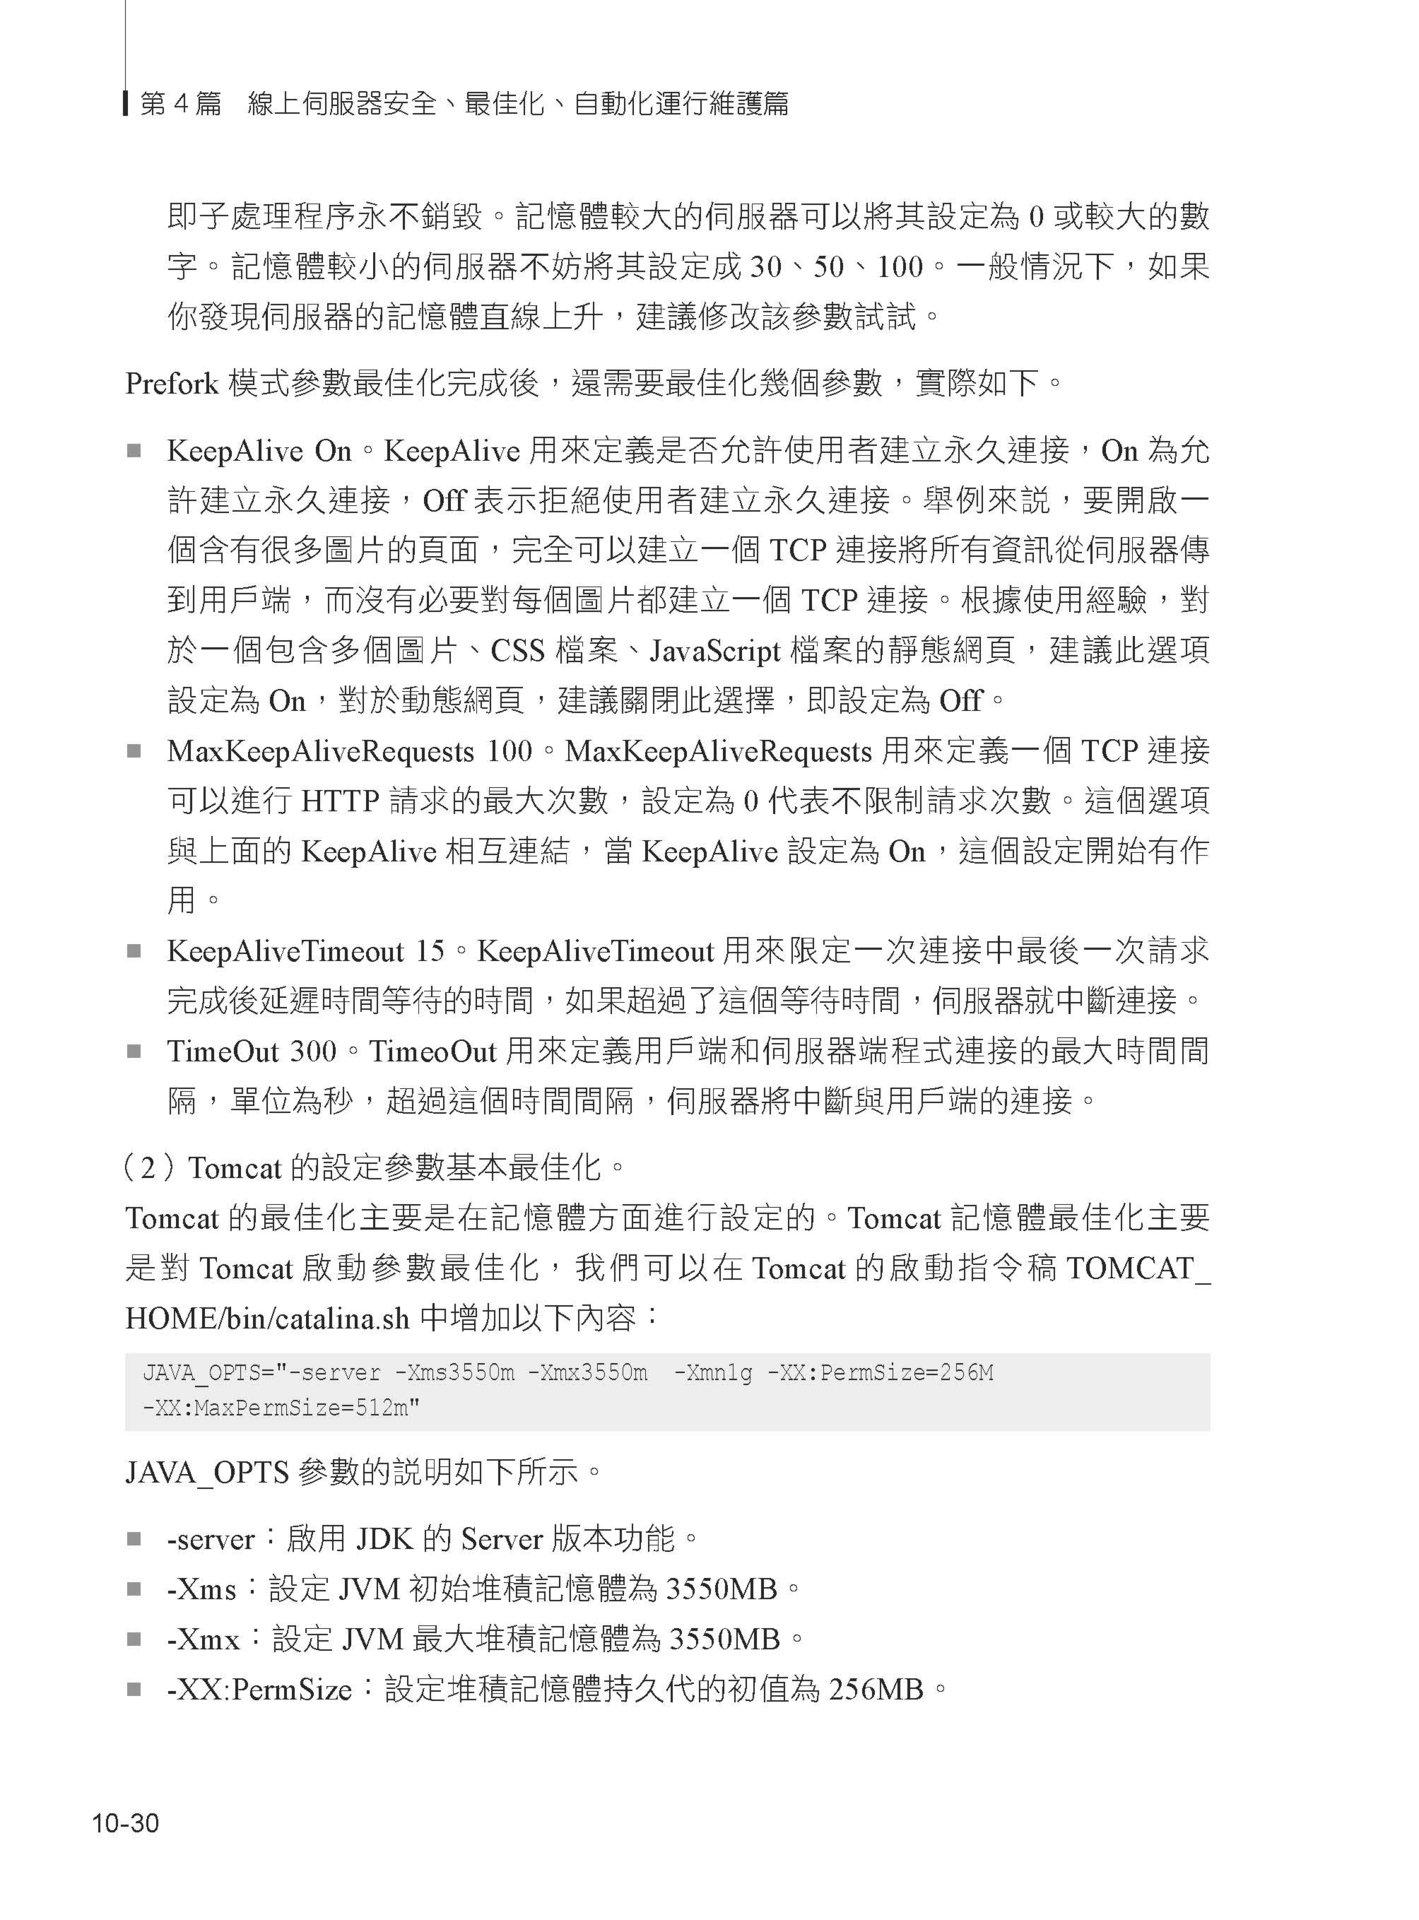 Linux 運維實作大全:高效管理所有主流服務-preview-10